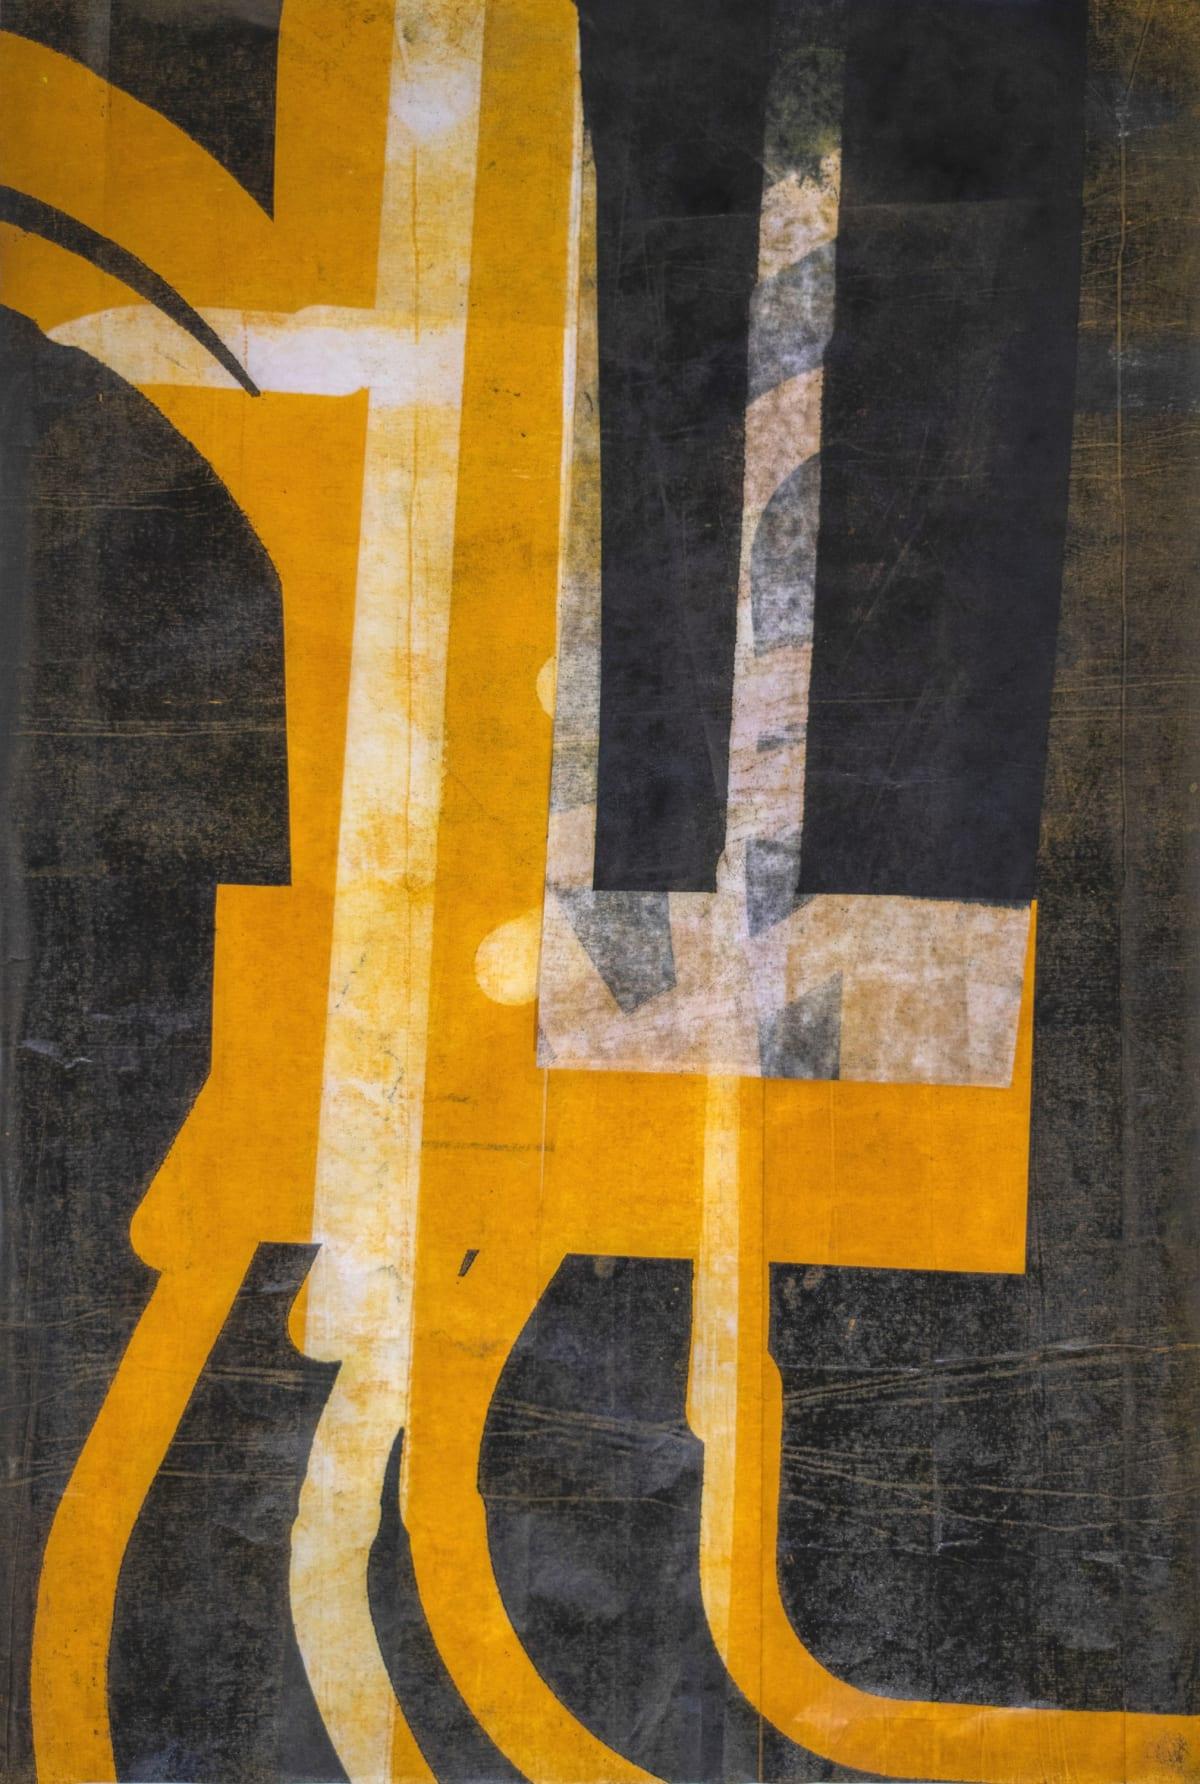 Thomas Gosebruch untitled, 2019 woodcut 46 x 31 cm unique proof